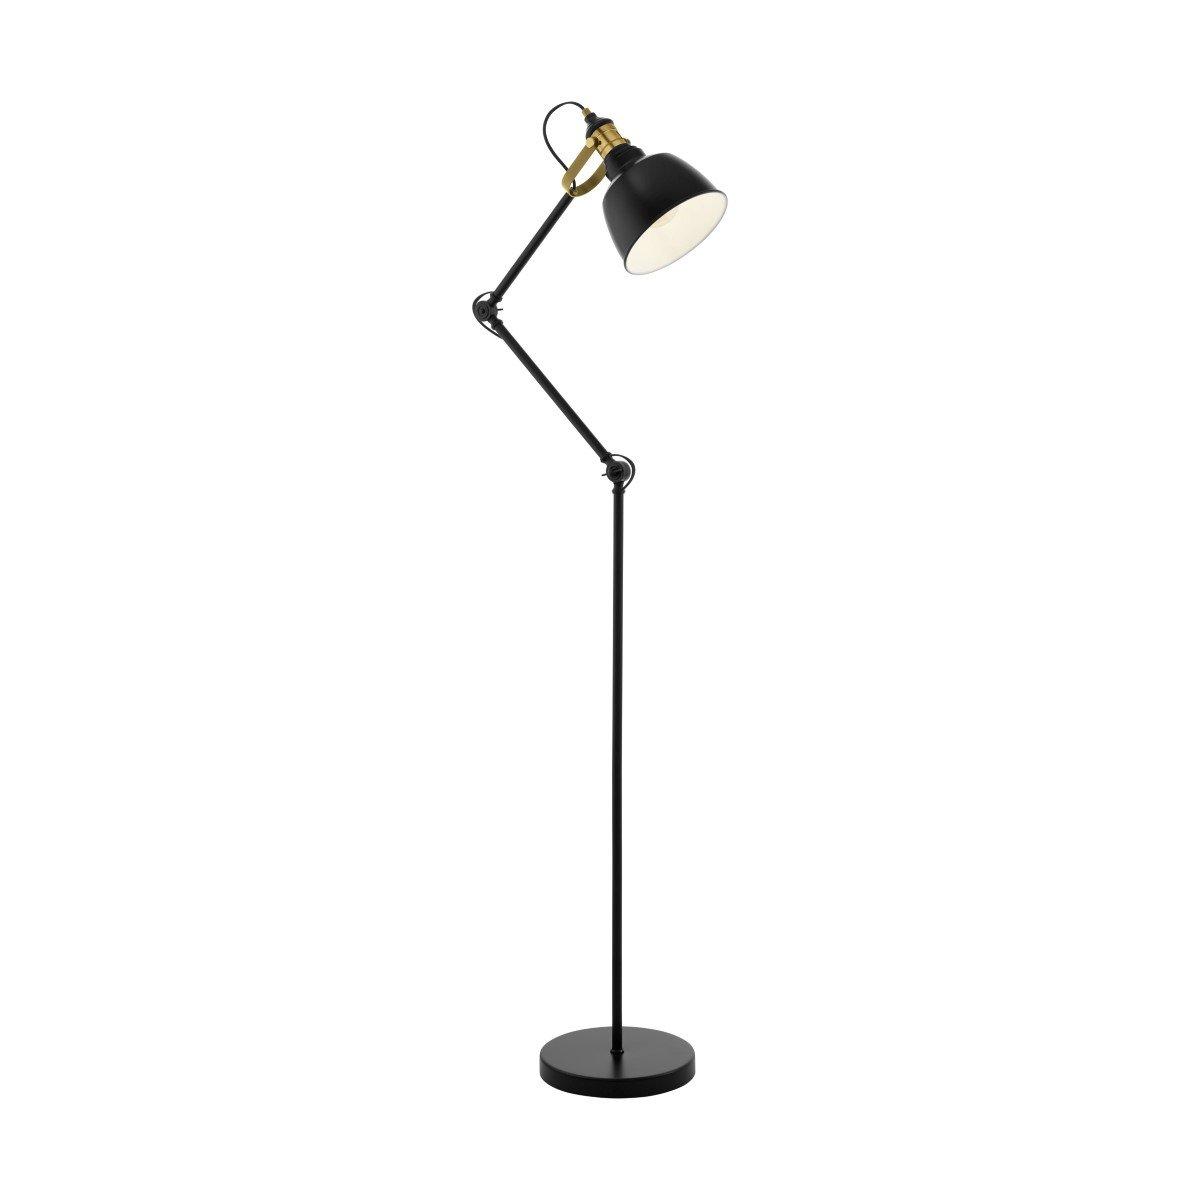 Eglo Vloerlamp Thornford Eglo 49524